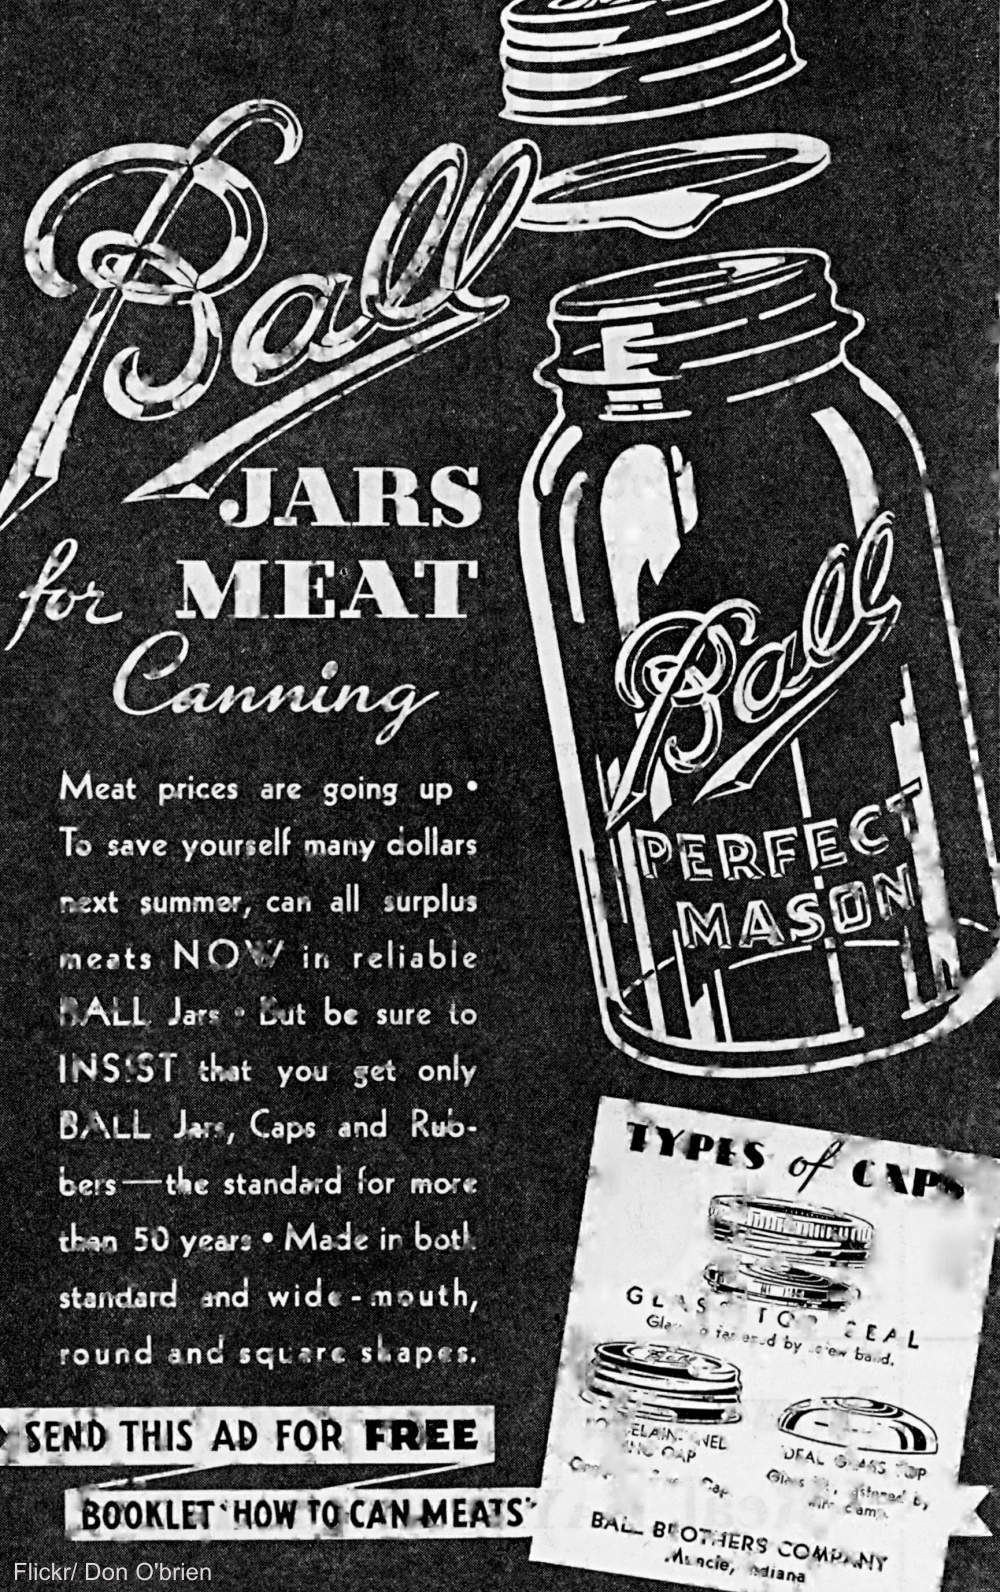 Black & White Vintage Ball Jar Advertisement